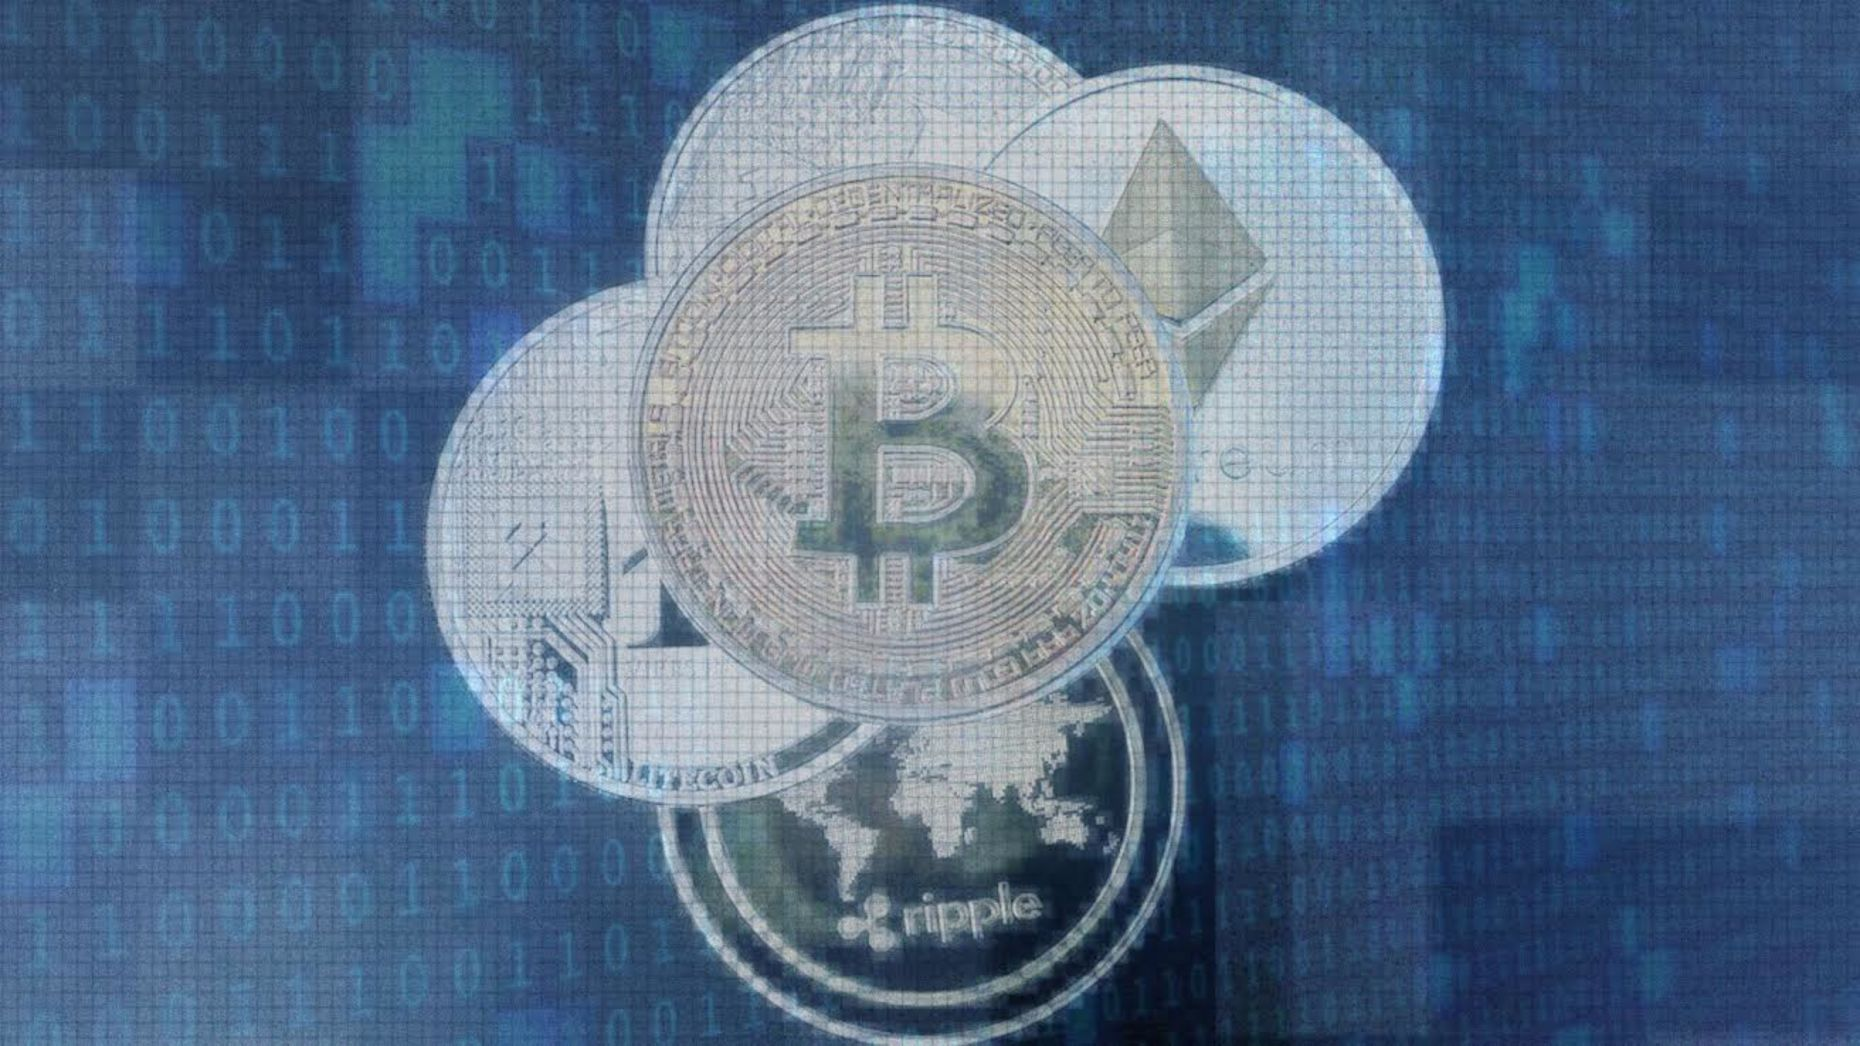 Bonds on the Blockchain